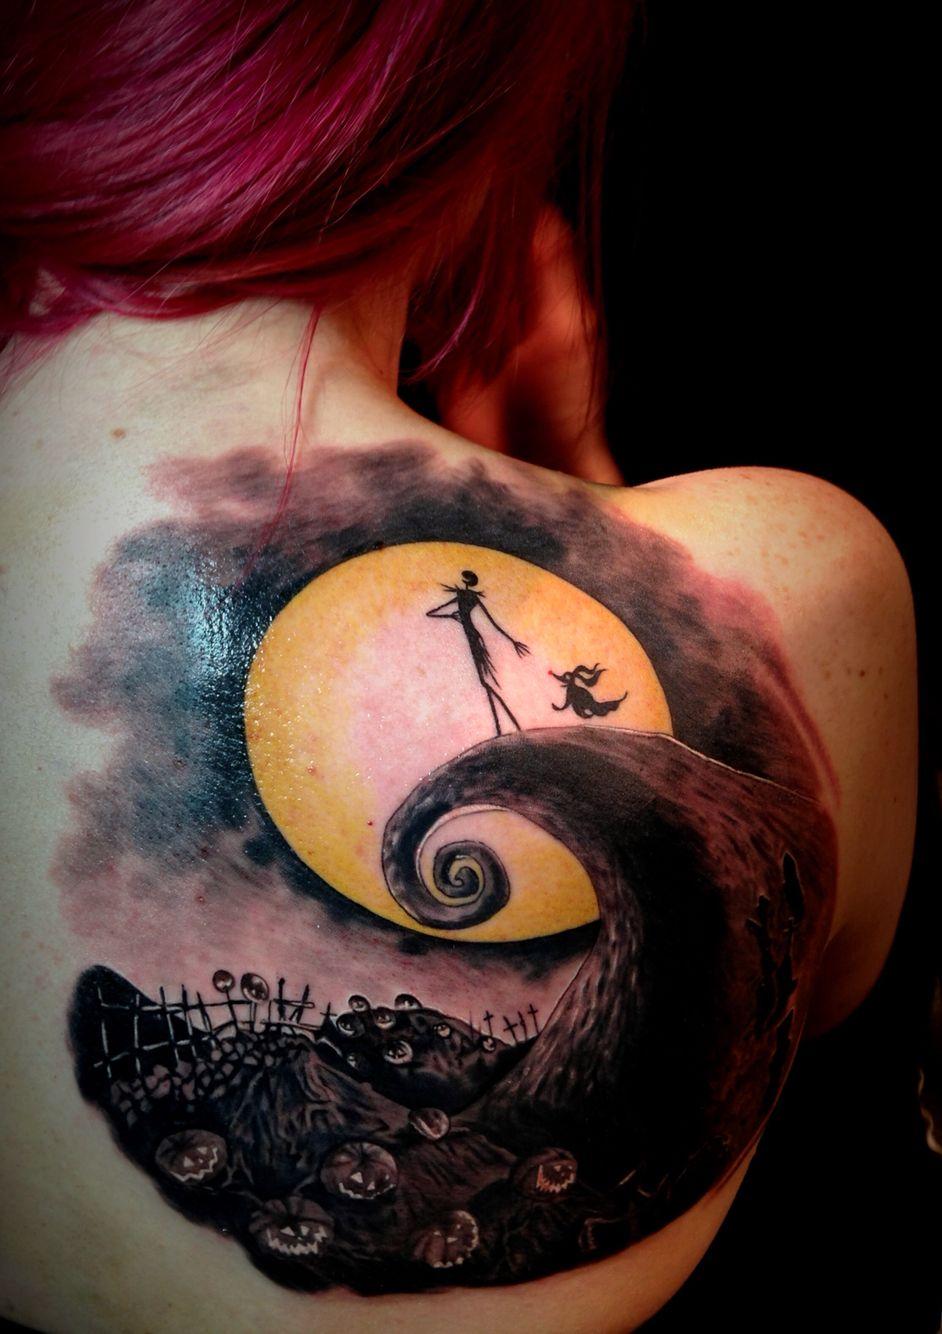 Nightmare Before Christmas Tattoo | Tattoos :) | Pinterest ...